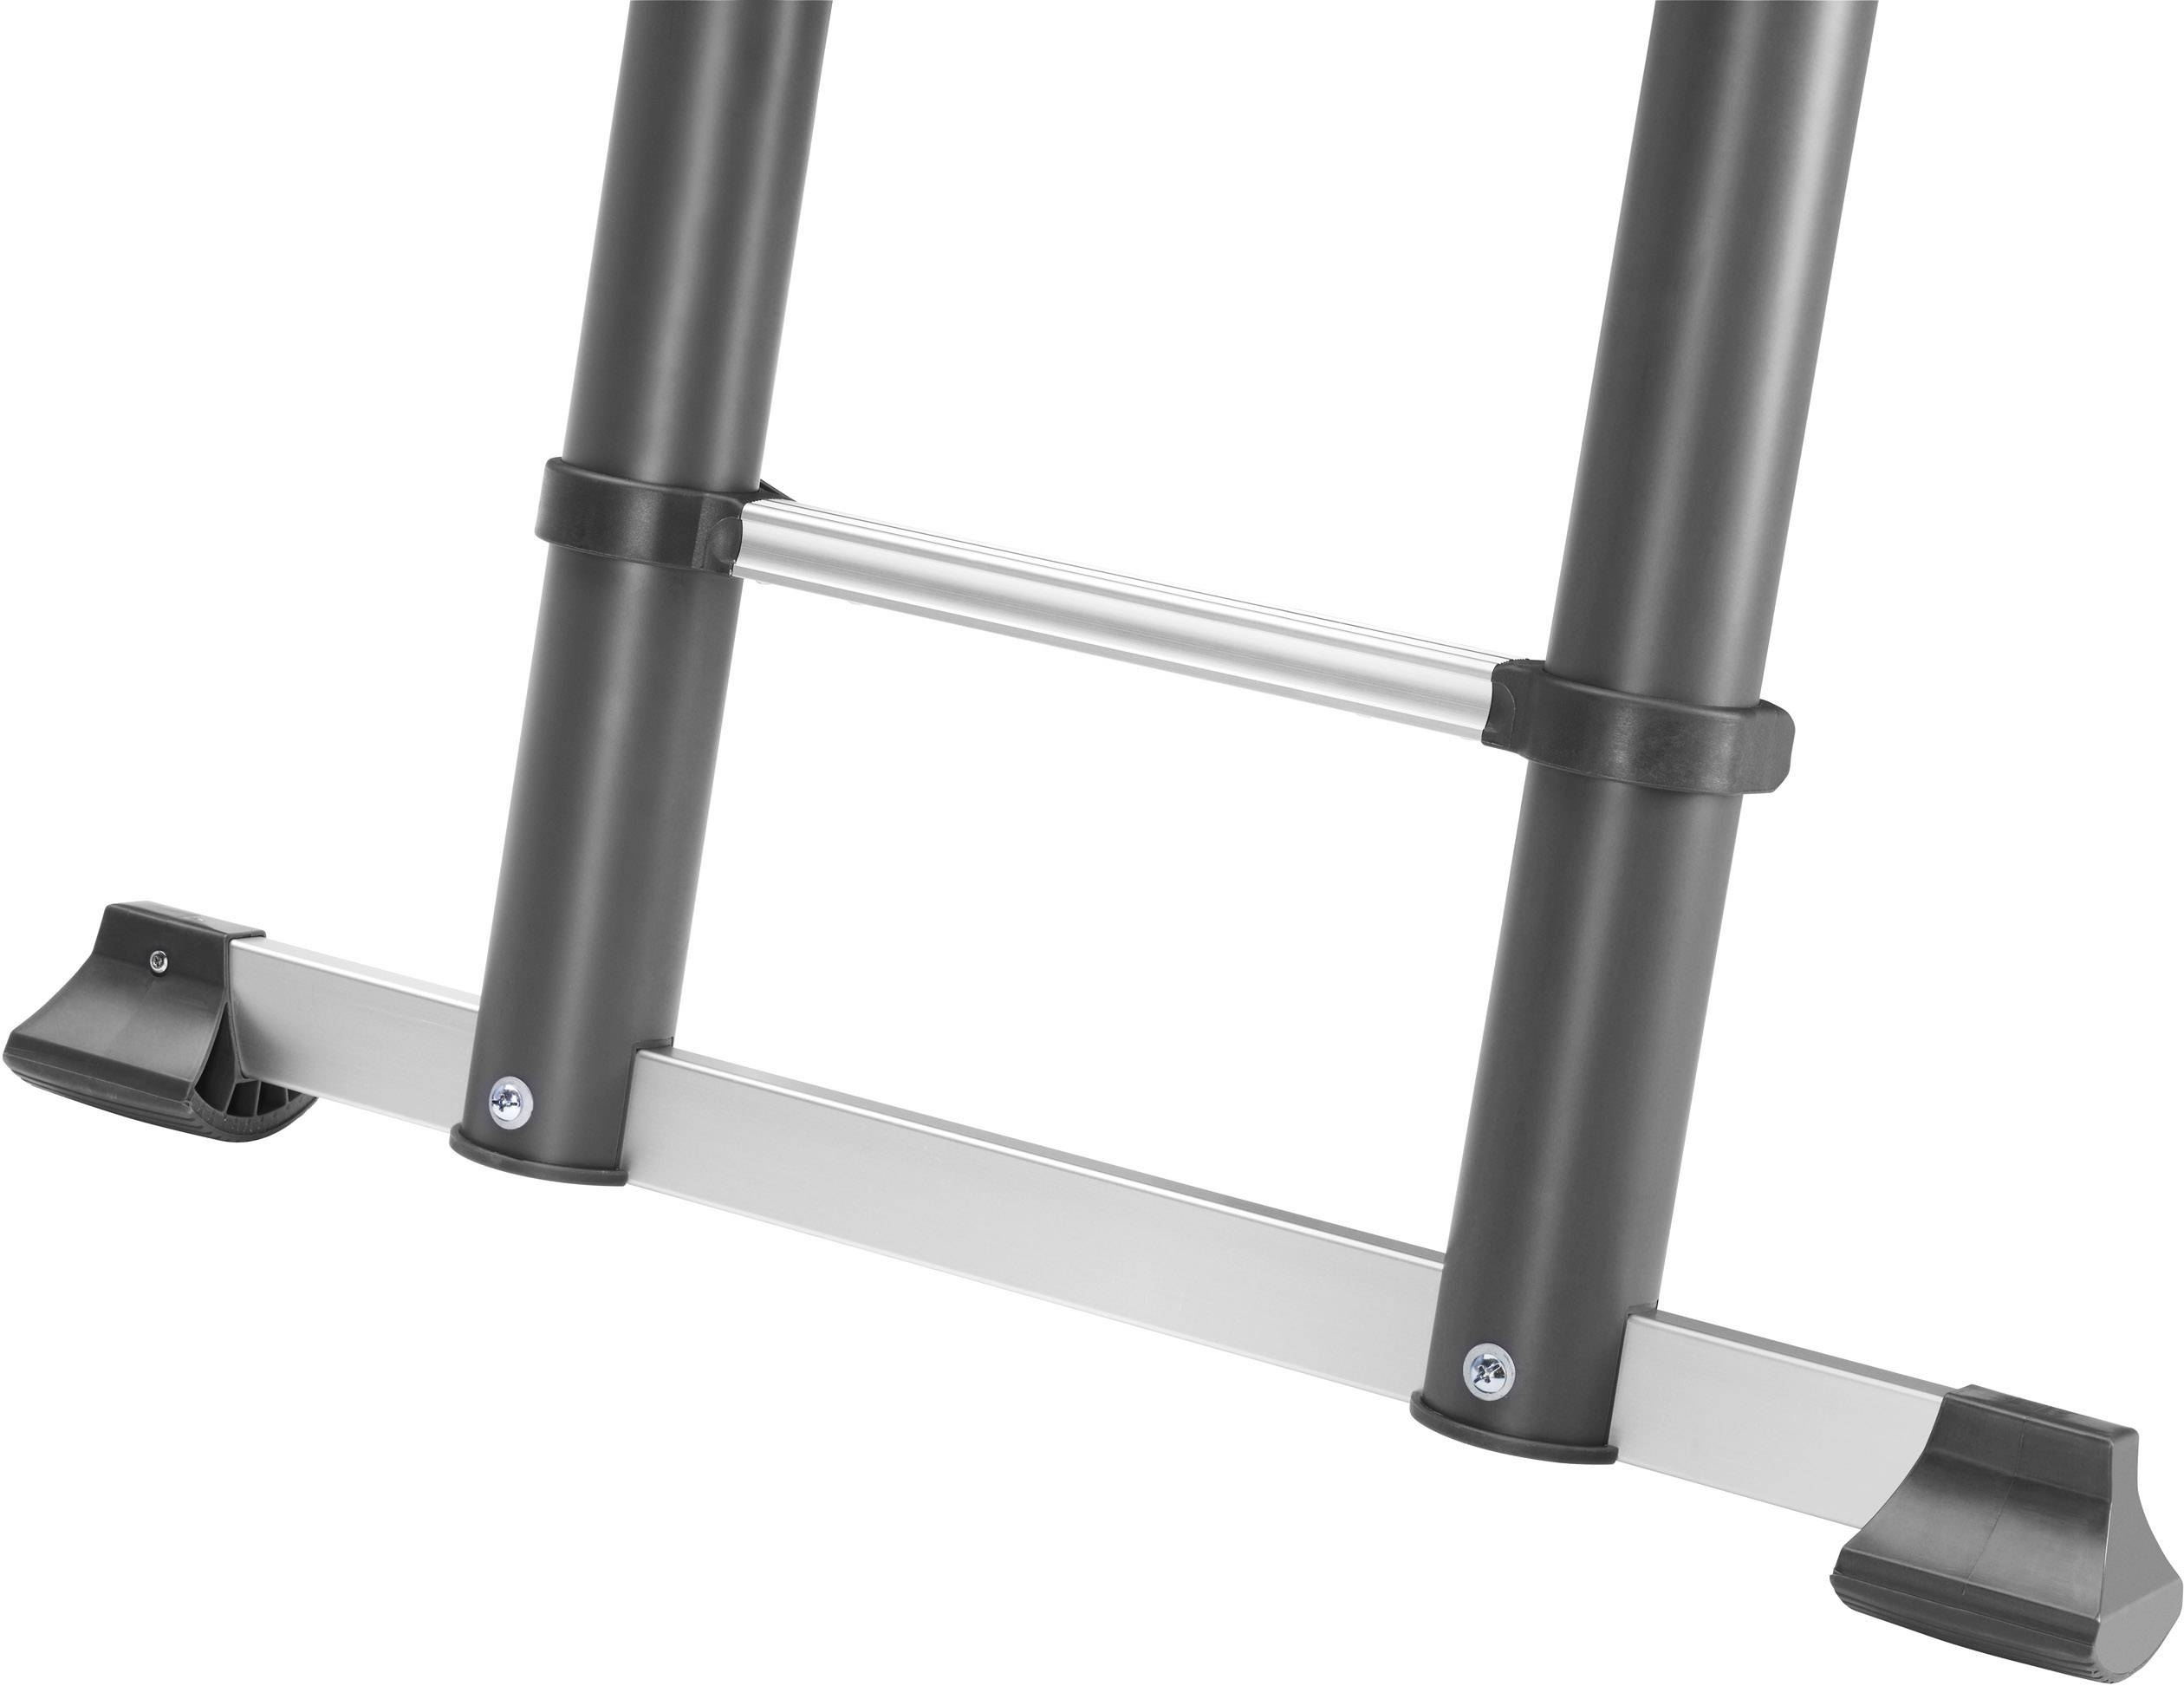 Hailo profiline t aluminium teleskopleiter inkl